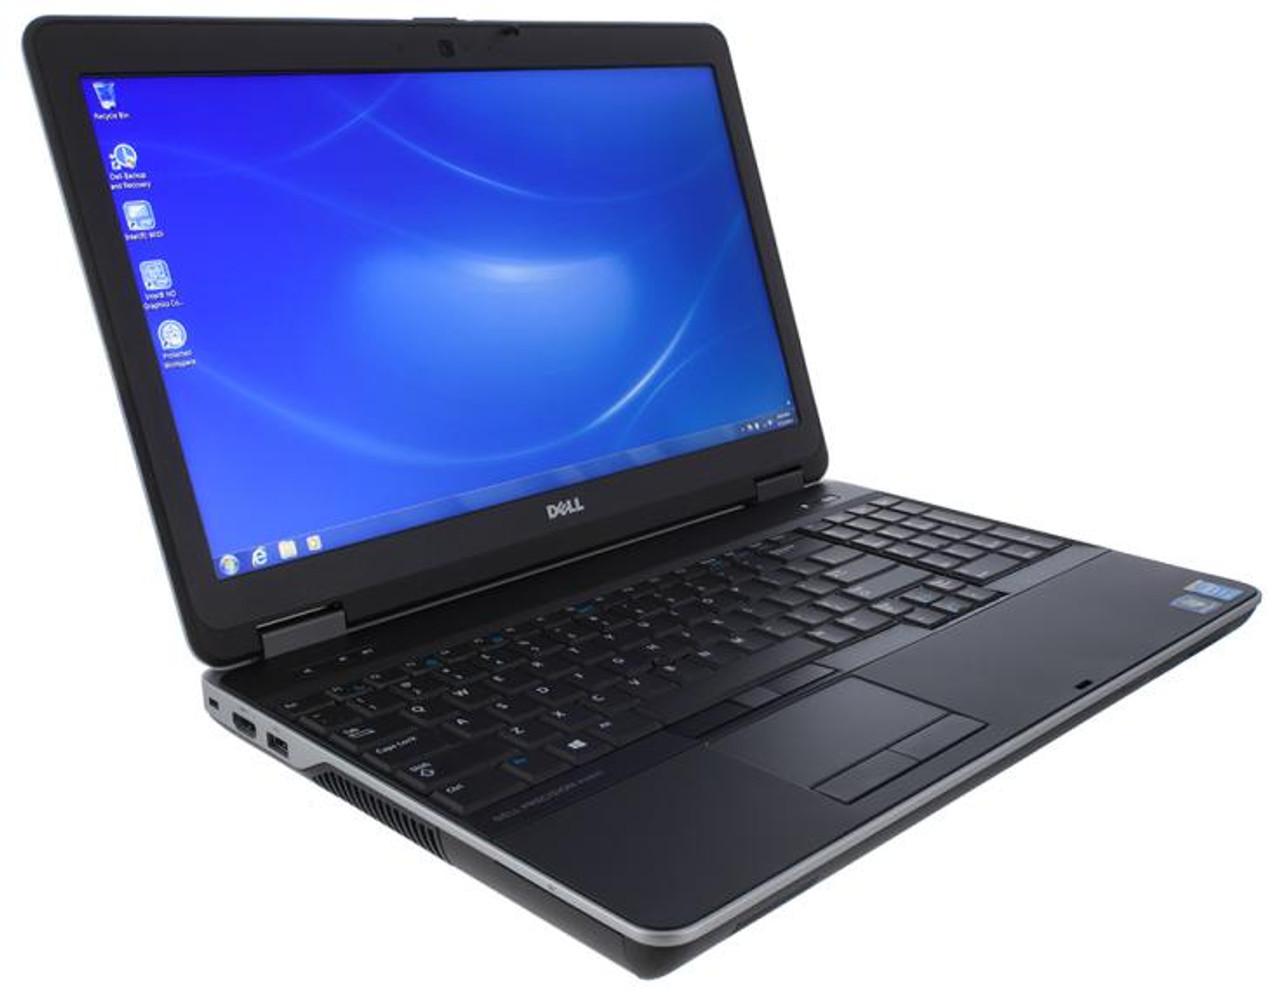 Dell Precision M2800 Laptop Quad Core i5 2.7GHz, 16GB Ram, 250GB SSD, DVD-RW, Windows 10 Pro 64